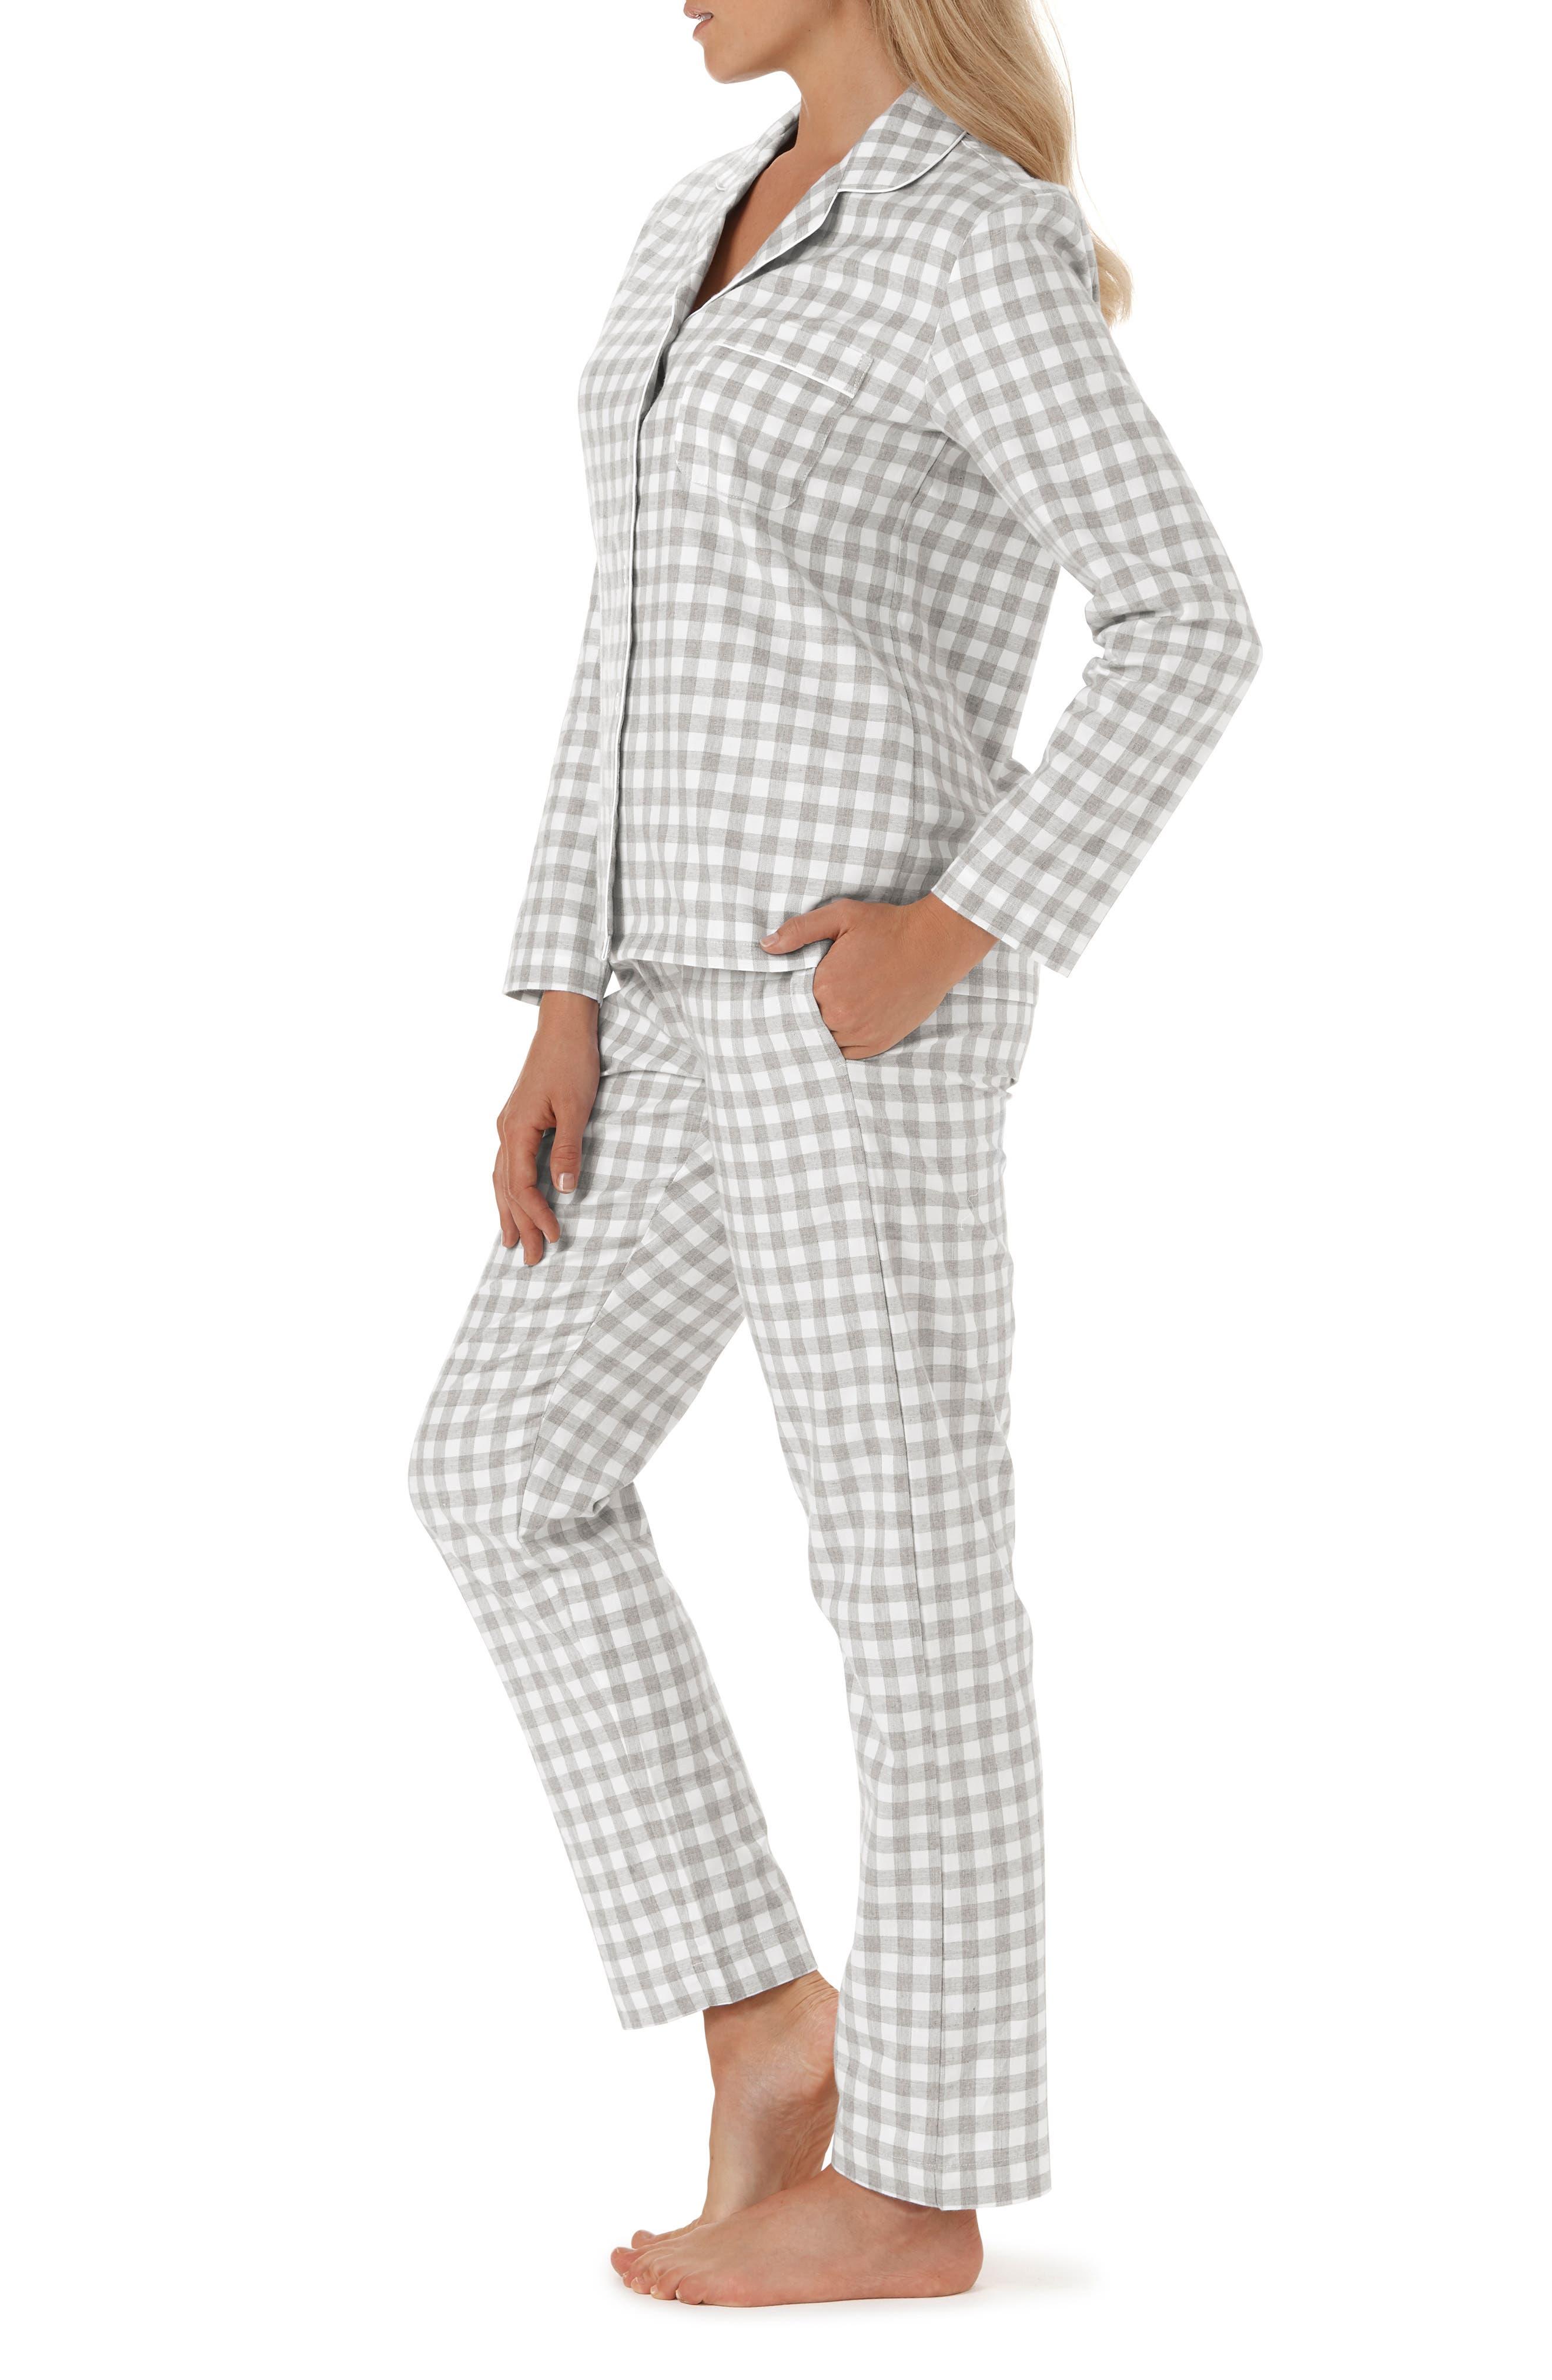 Gingham Check Pajamas,                             Alternate thumbnail 3, color,                             GREY/ WHITE GINGHAM